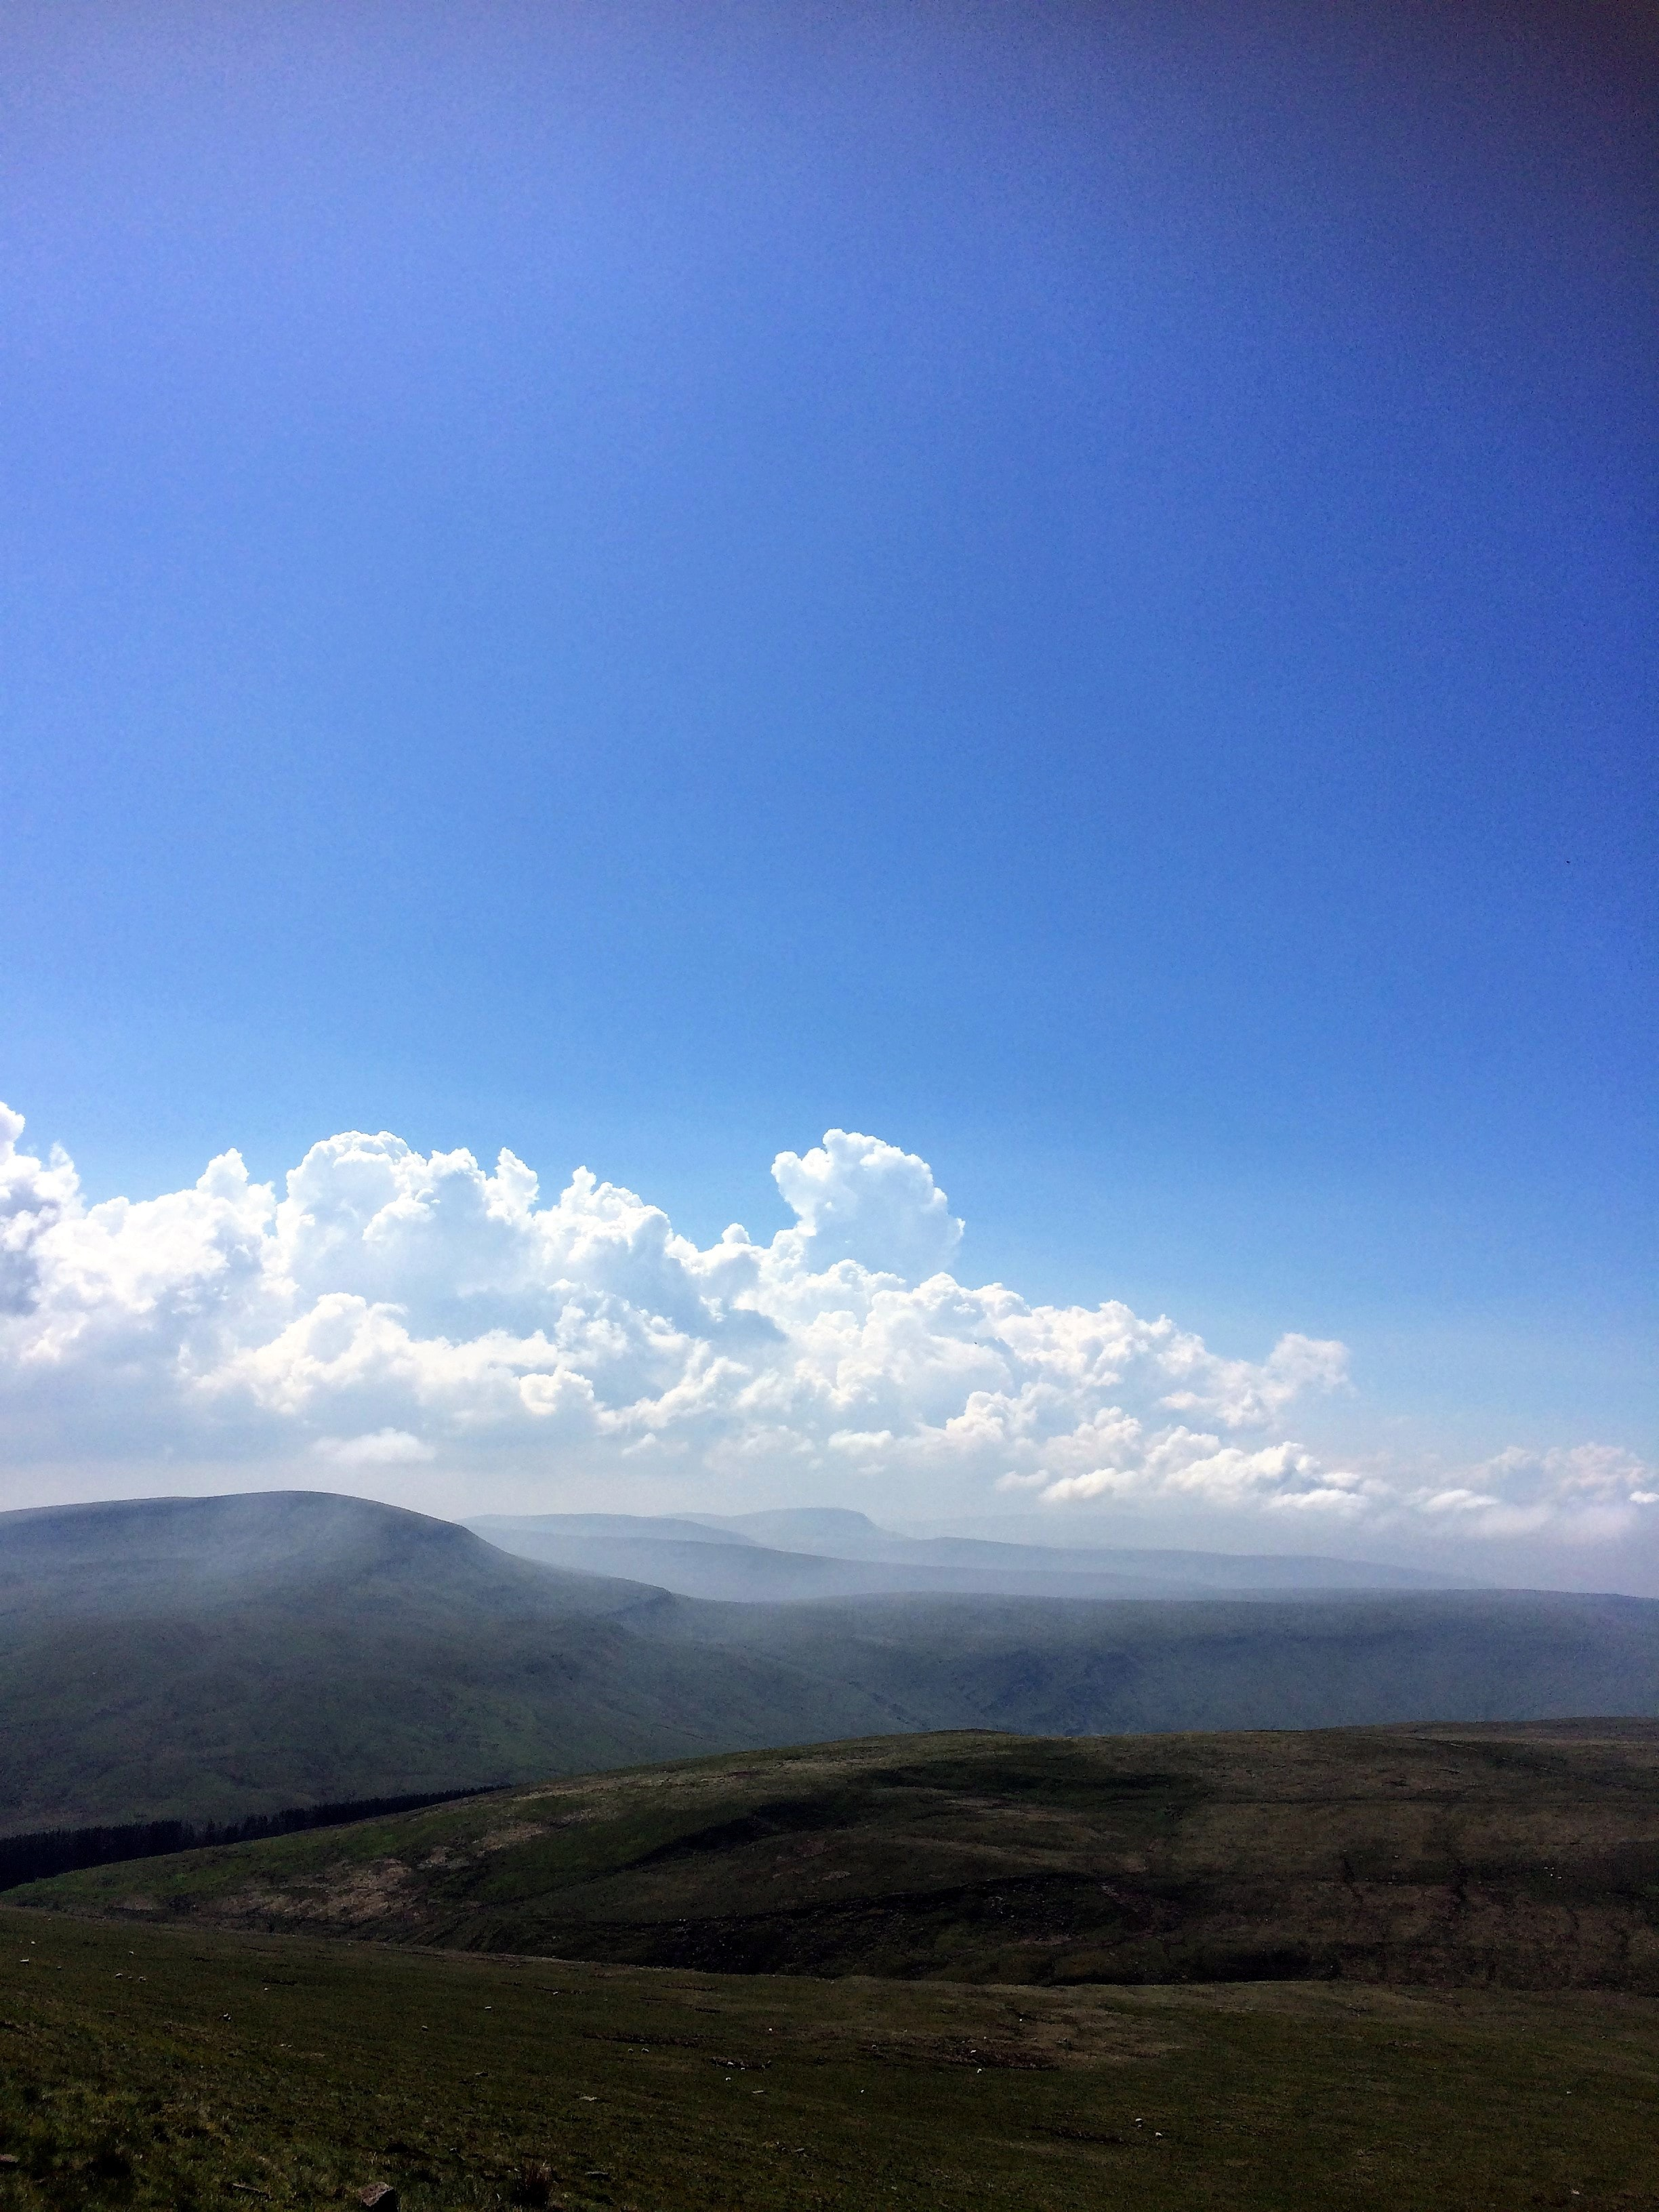 Family-friendly mountain climb at Pen y Fan, Wales - The ...